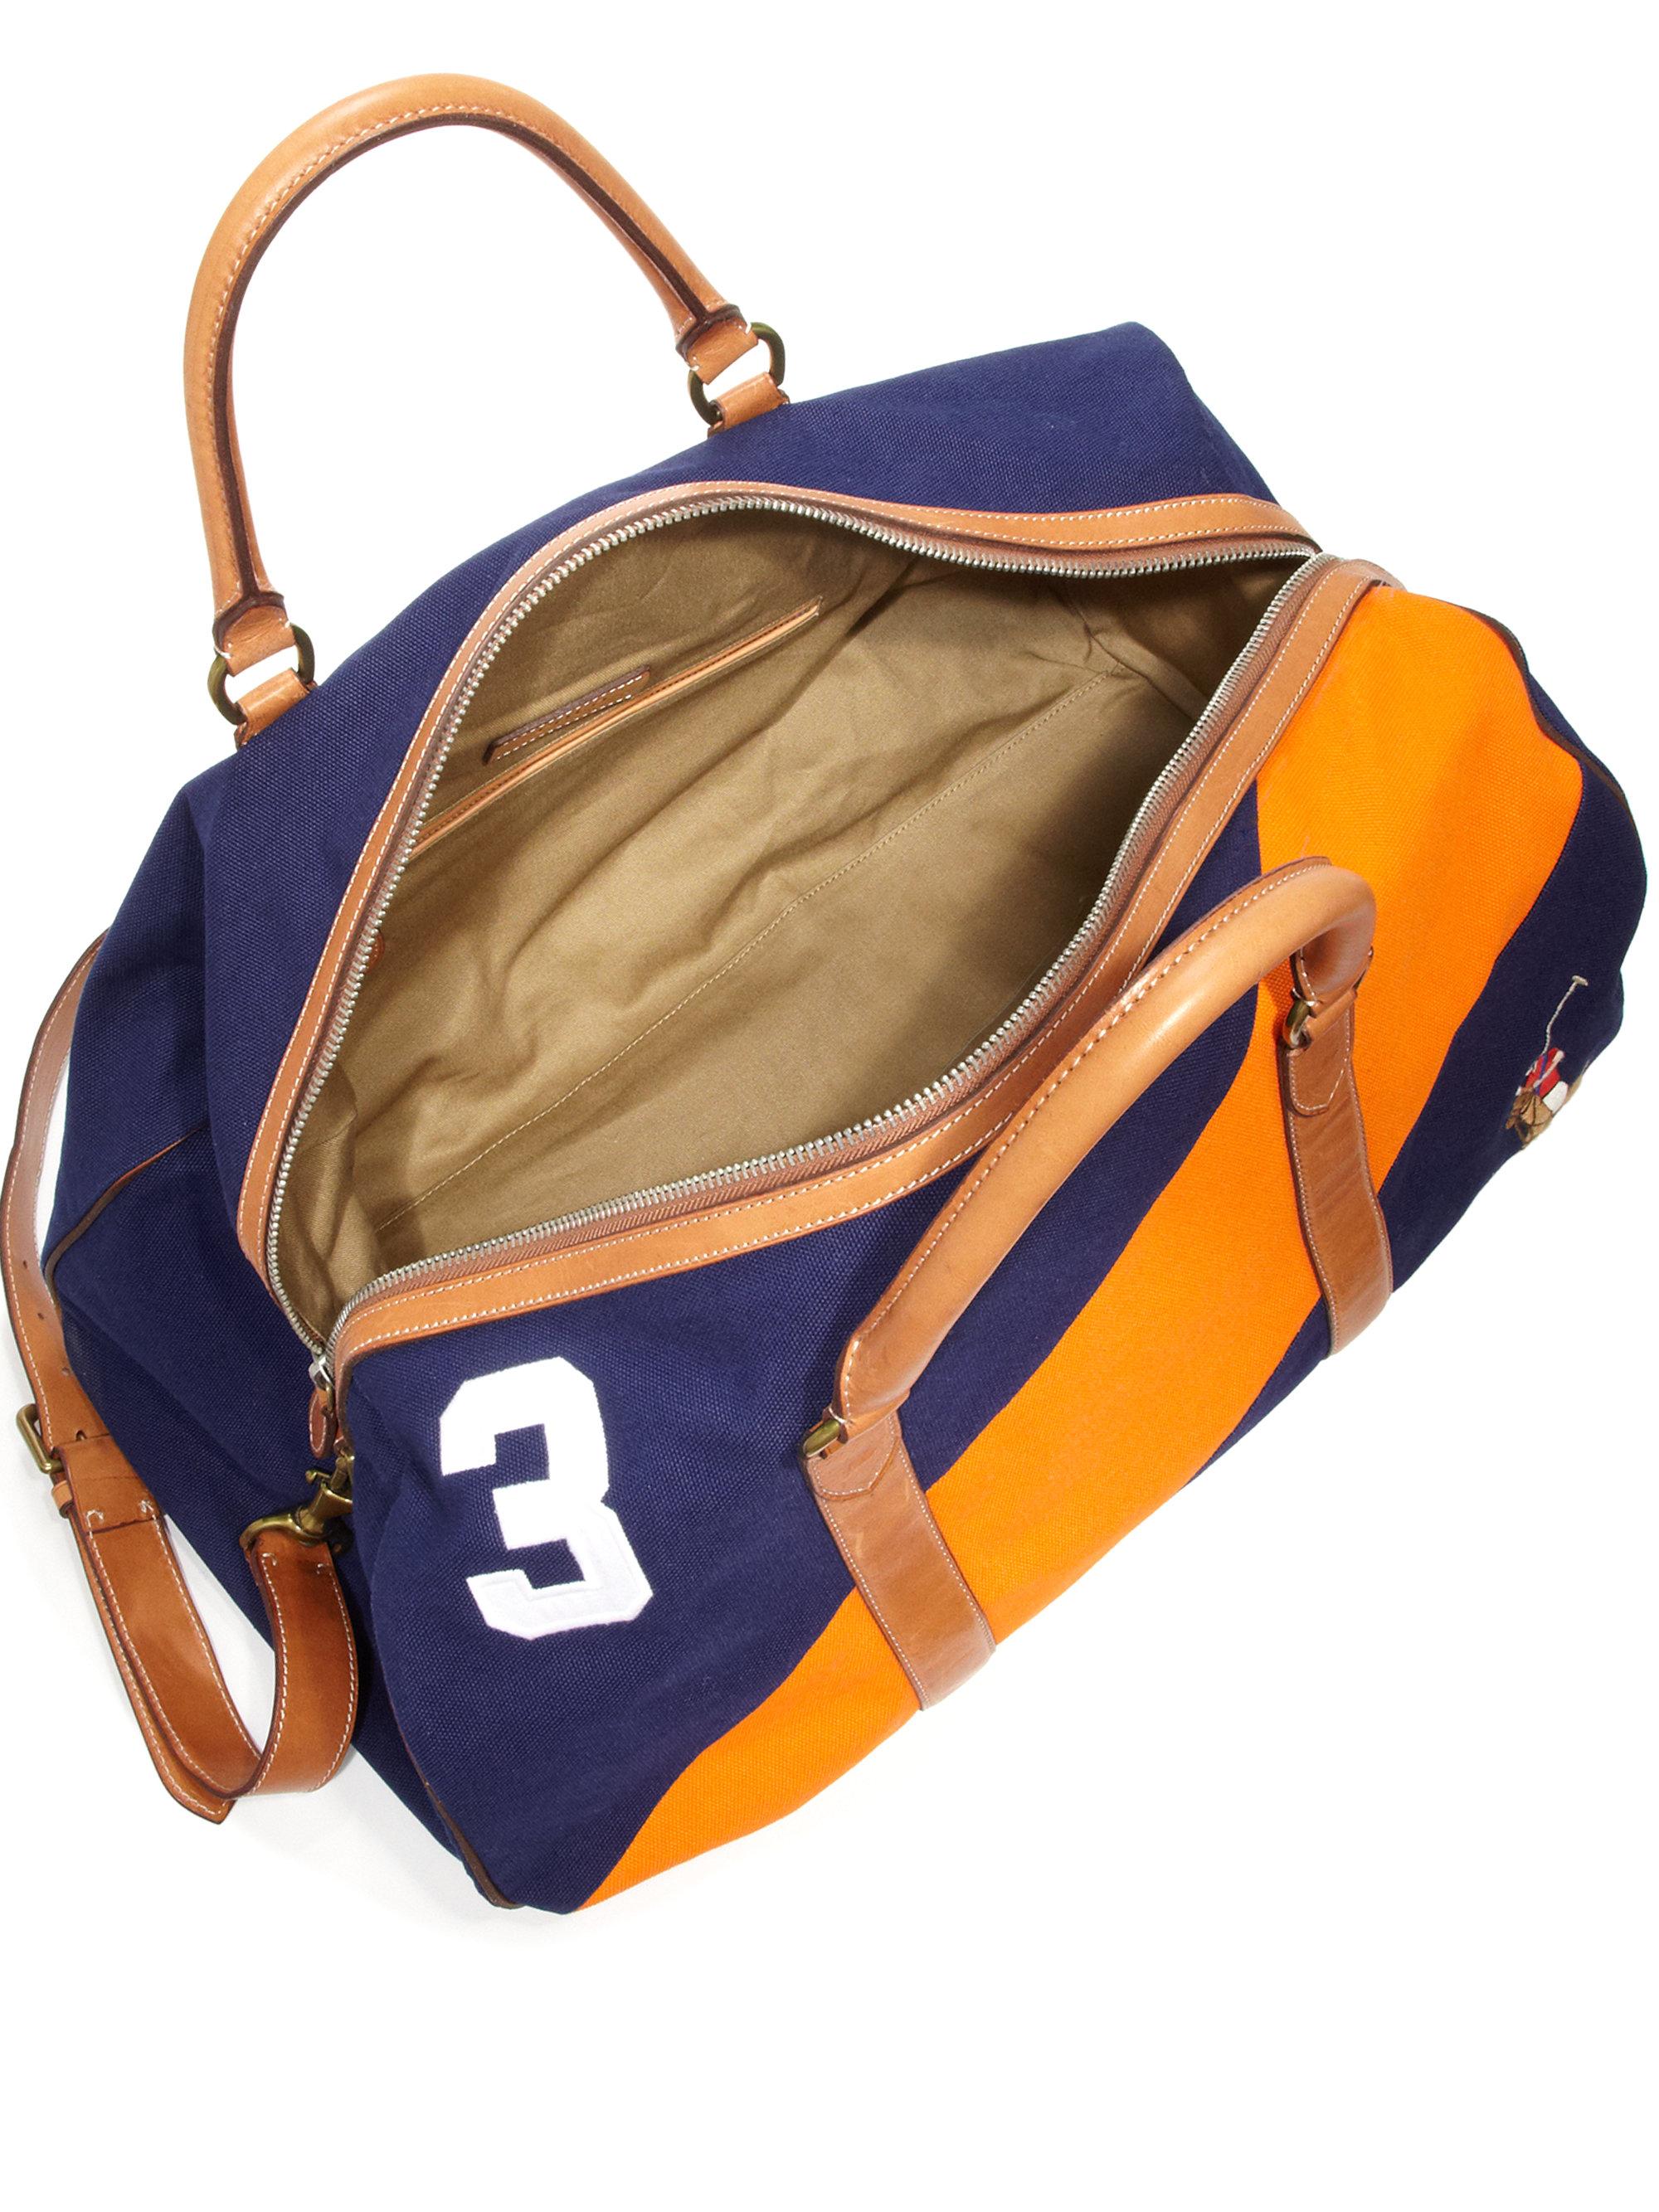 256ca5b95d ... low cost lyst polo ralph lauren regatta duffel bag in yellow for men  3f74c 75c6b ...